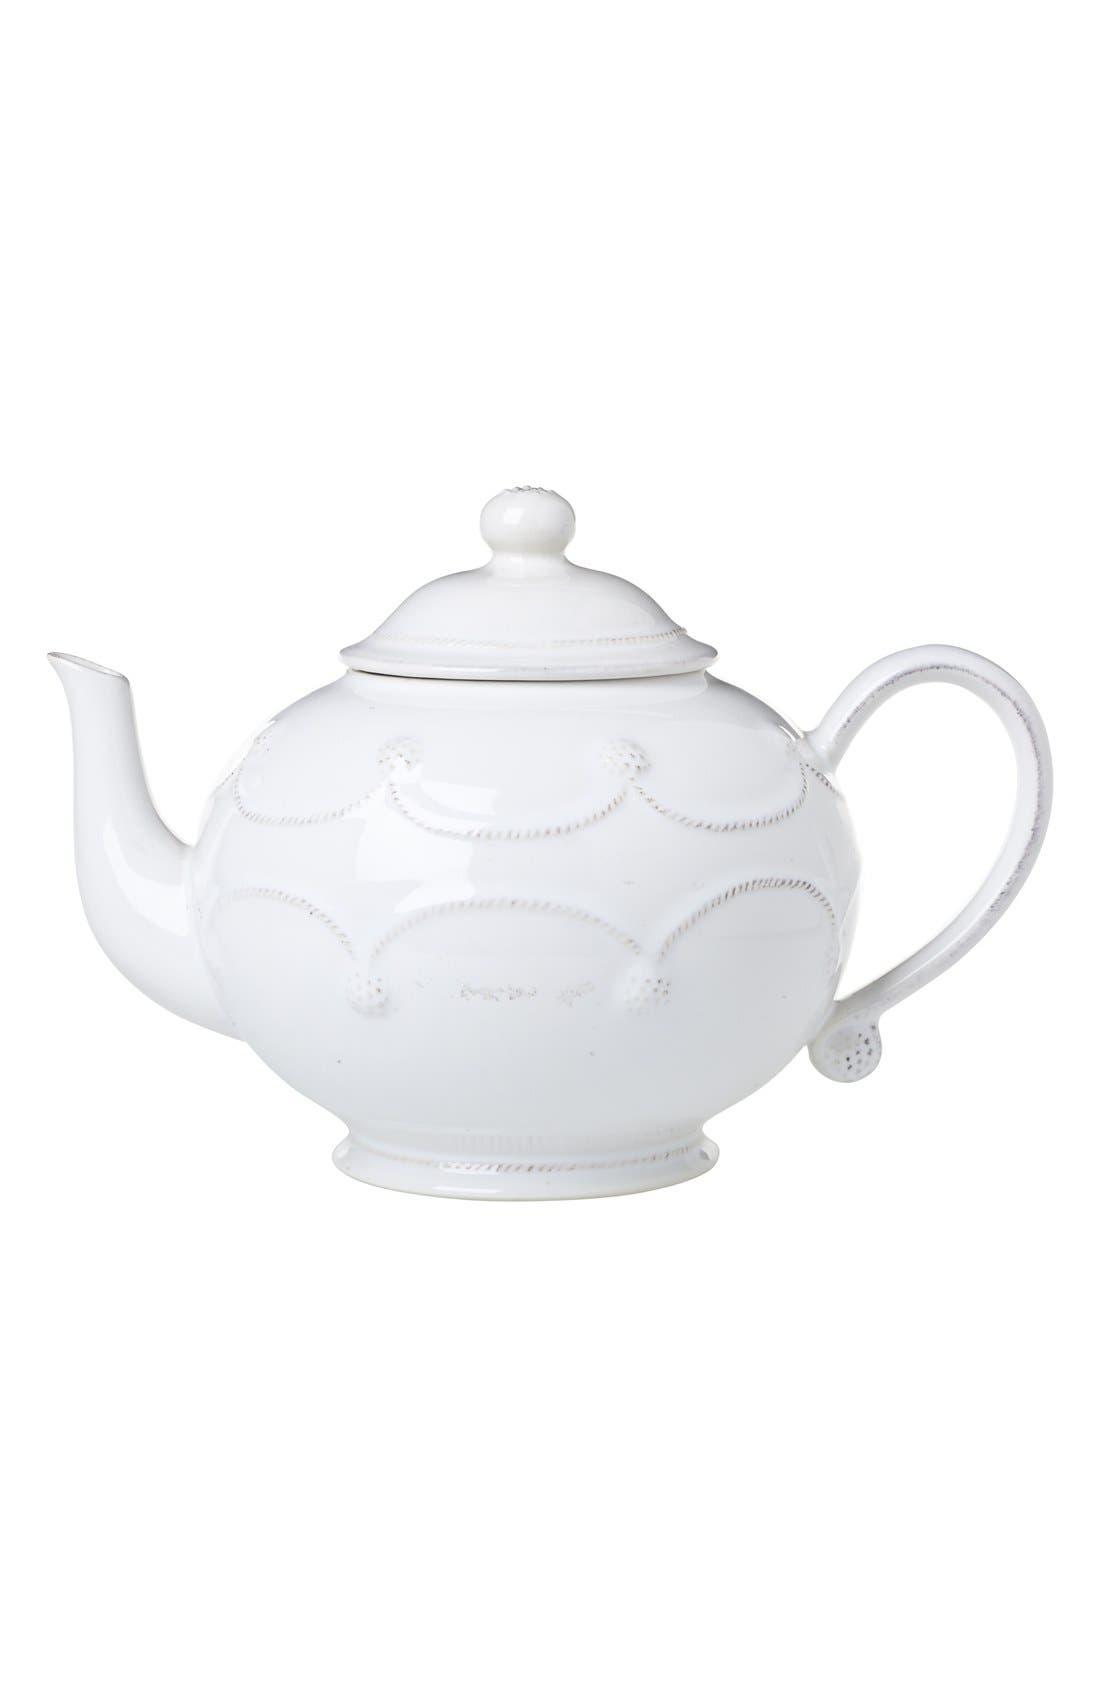 'Berry and Thread' Ceramic Teapot,                             Main thumbnail 1, color,                             Whitewash